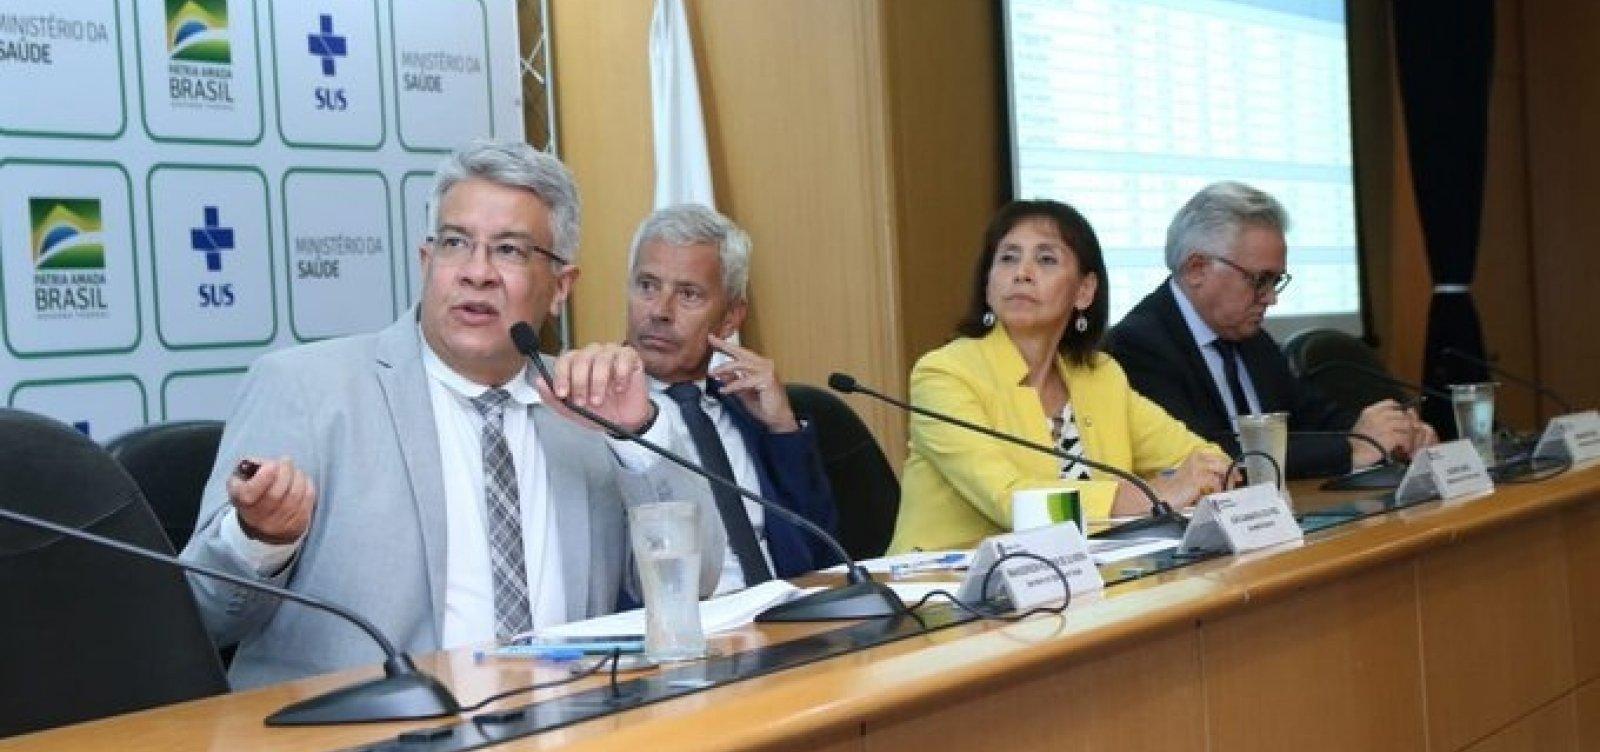 [ Ministério da Saúde confirma mais oito casos suspeitos de coronavírus na Bahia]